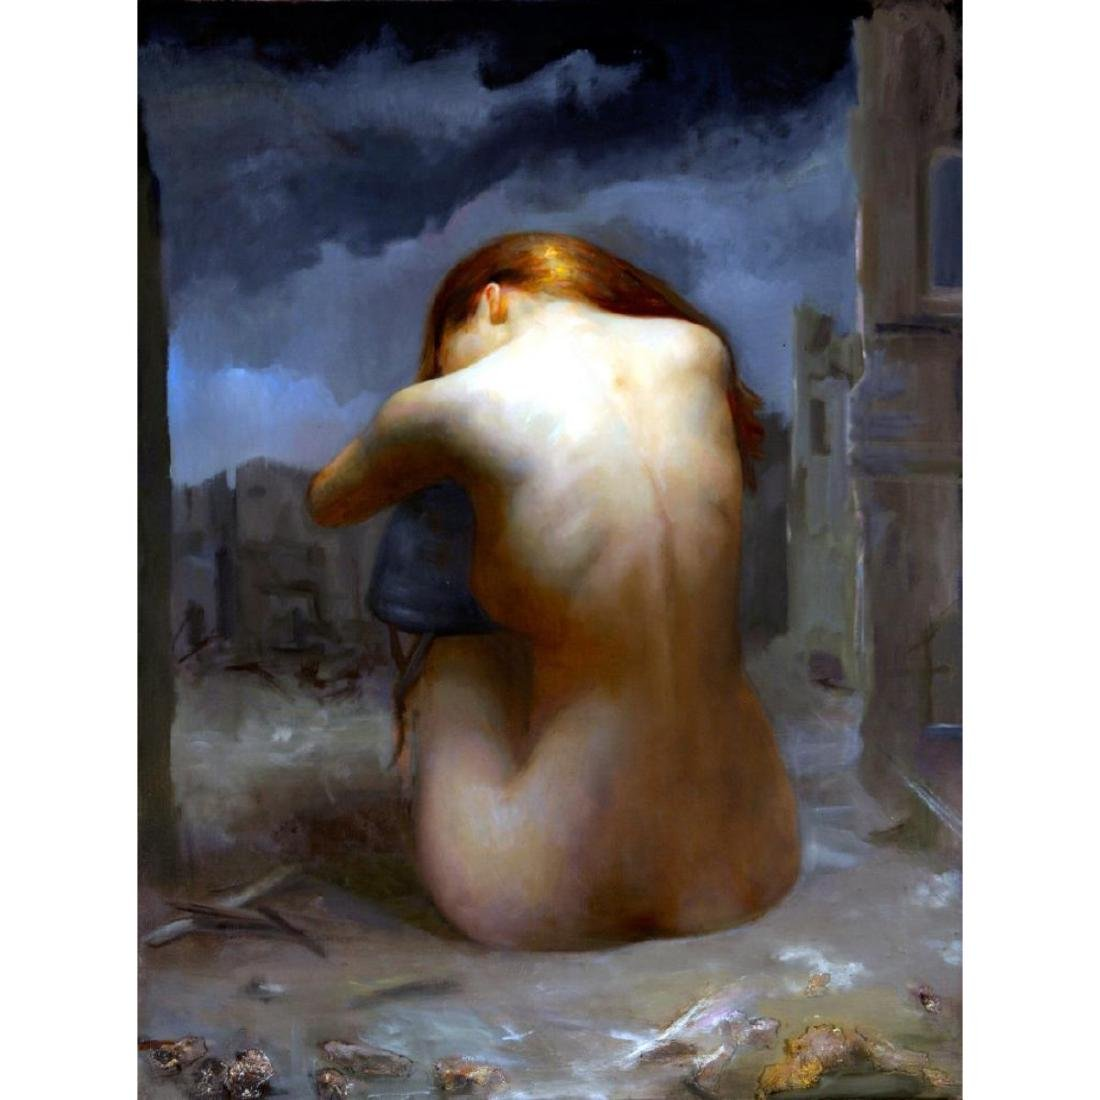 8 X 6 Vivid Art Nude Juliette Ceramic Mural Backsplash